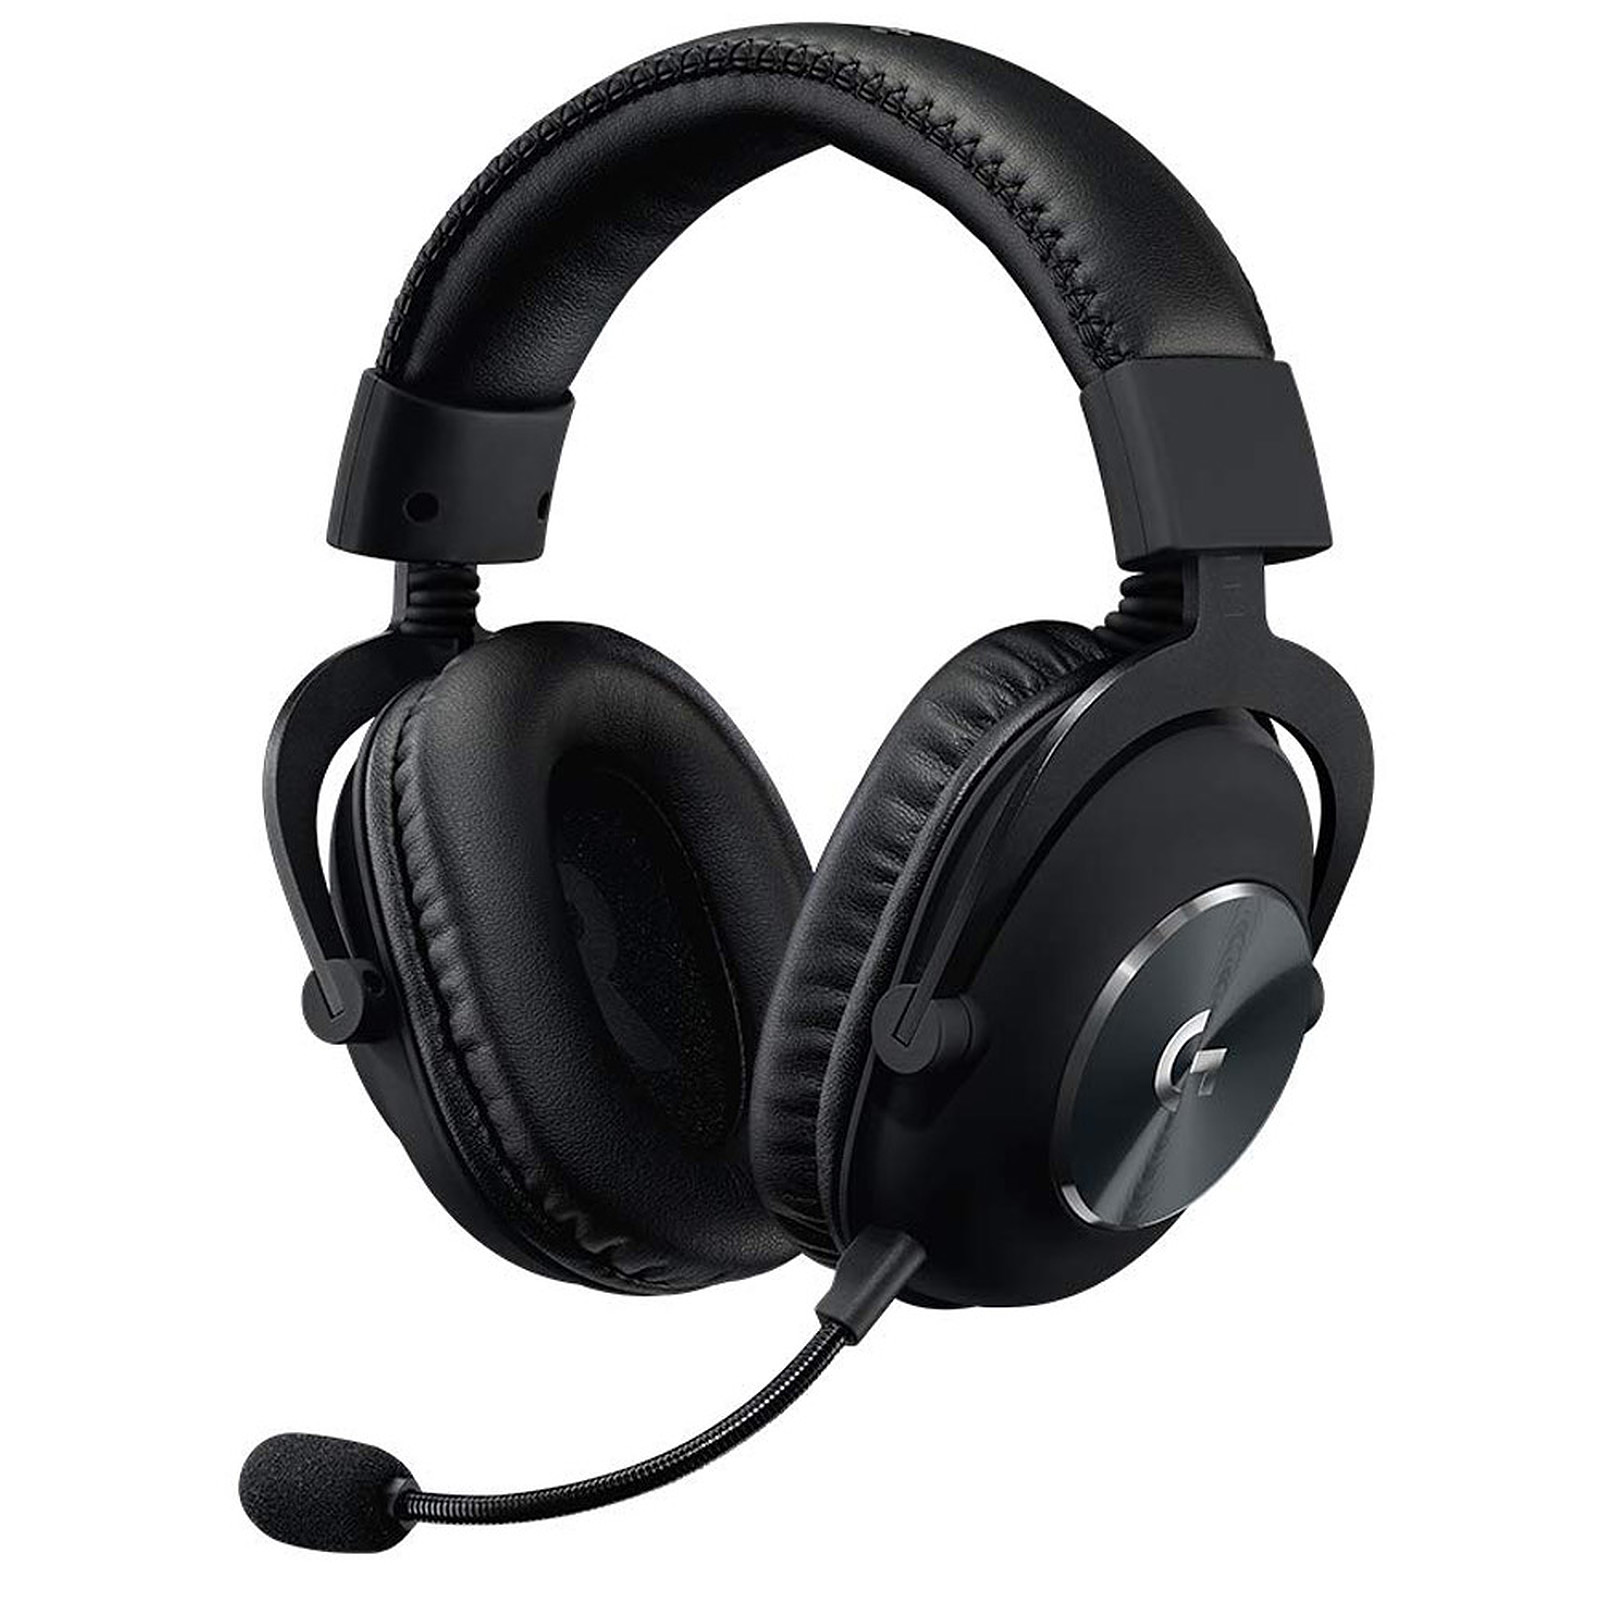 Logitech G Pro Gaming Headset Negro